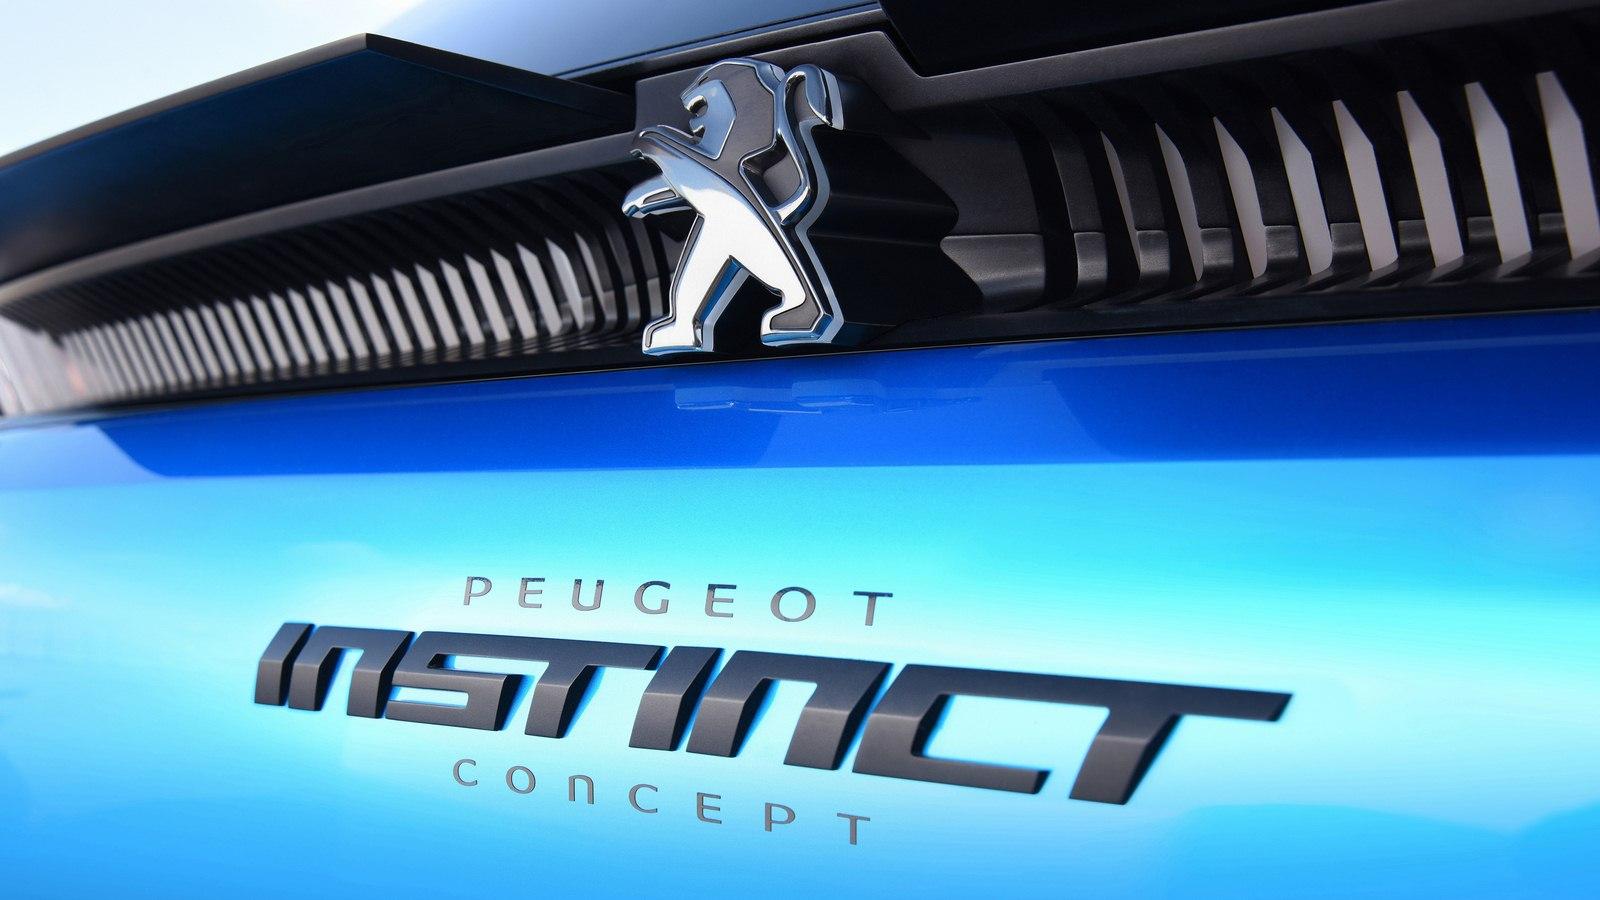 2017-Peugeot-Instinct-Concept-08